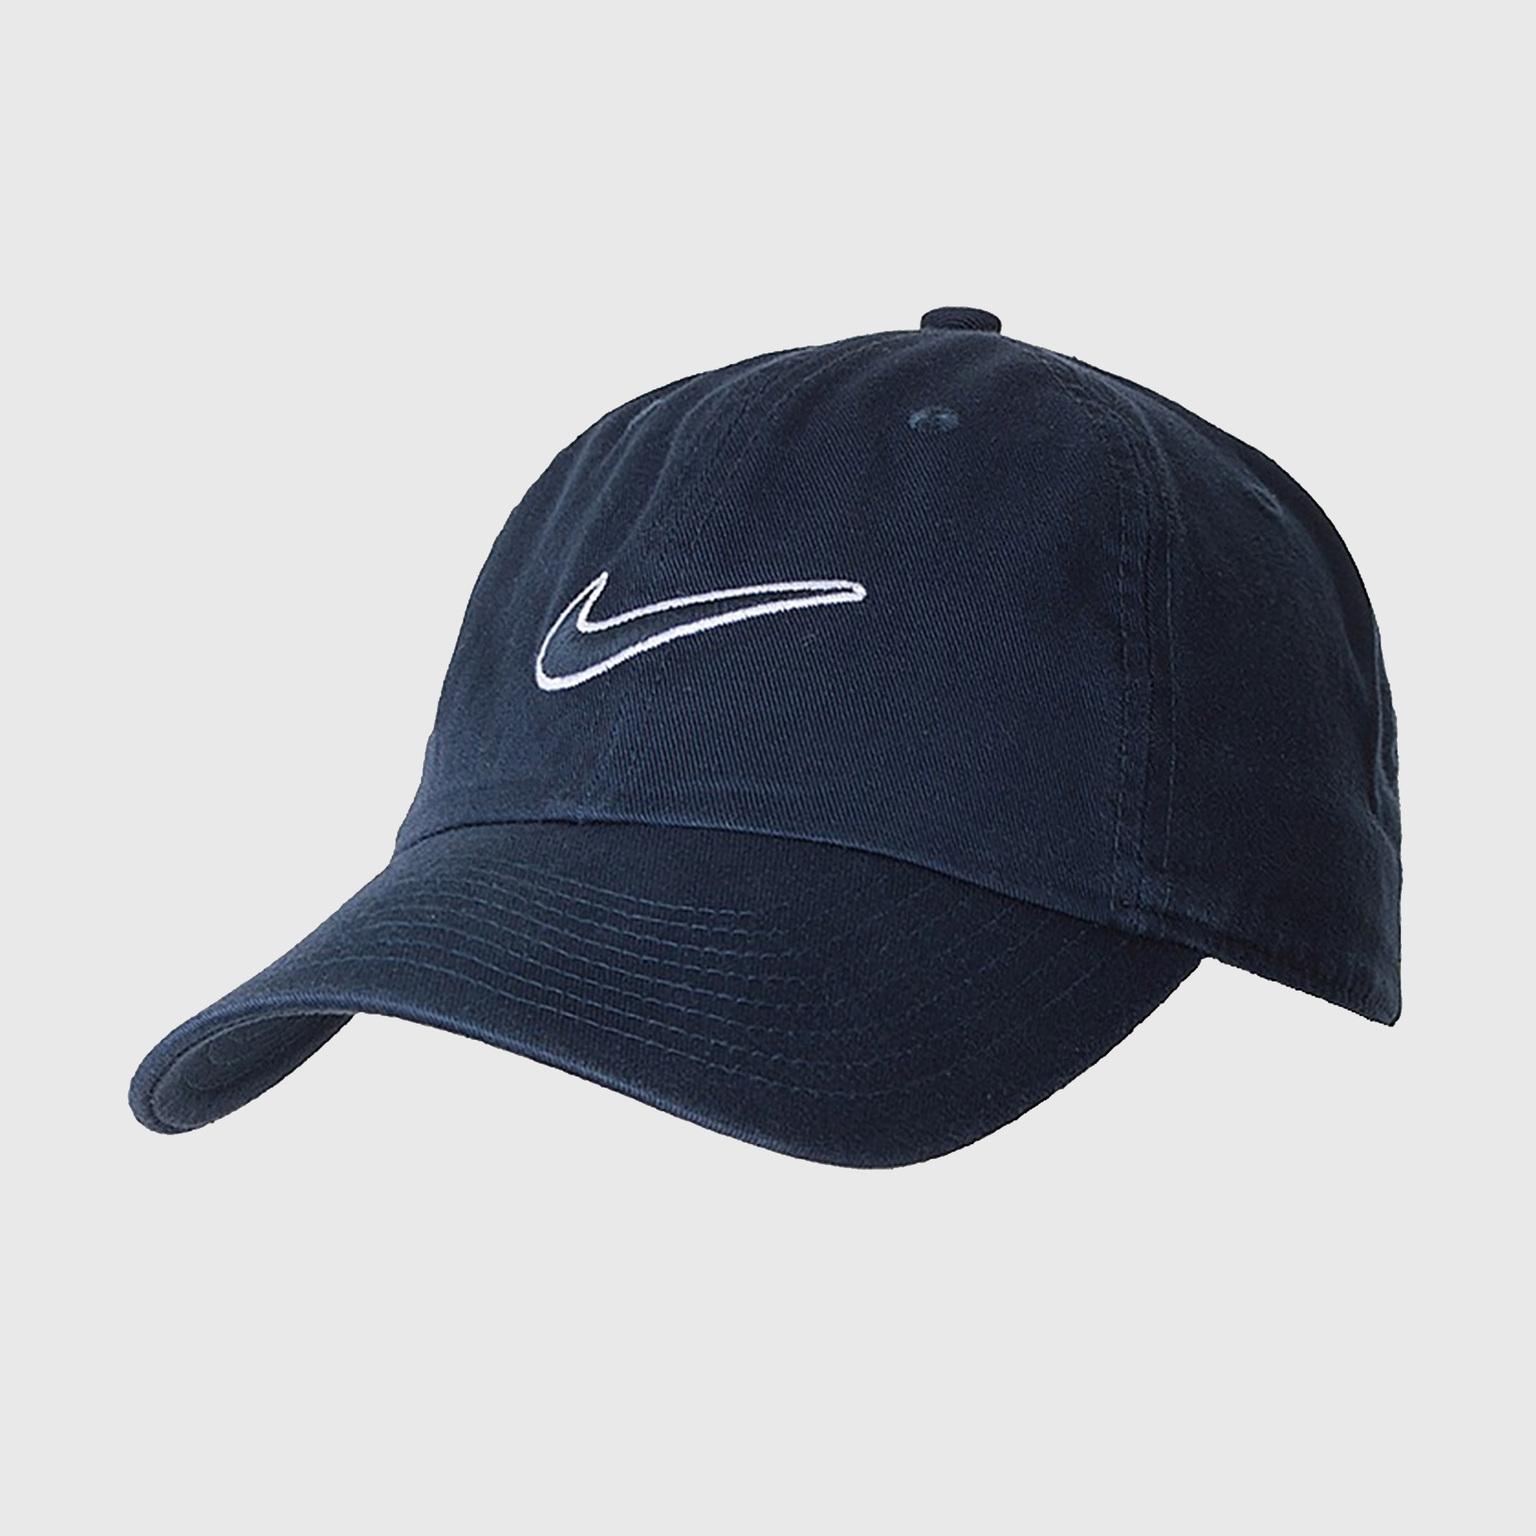 Бейсболка Nike Essential Swoosh 943091-451 nike nike swoosh wristbands